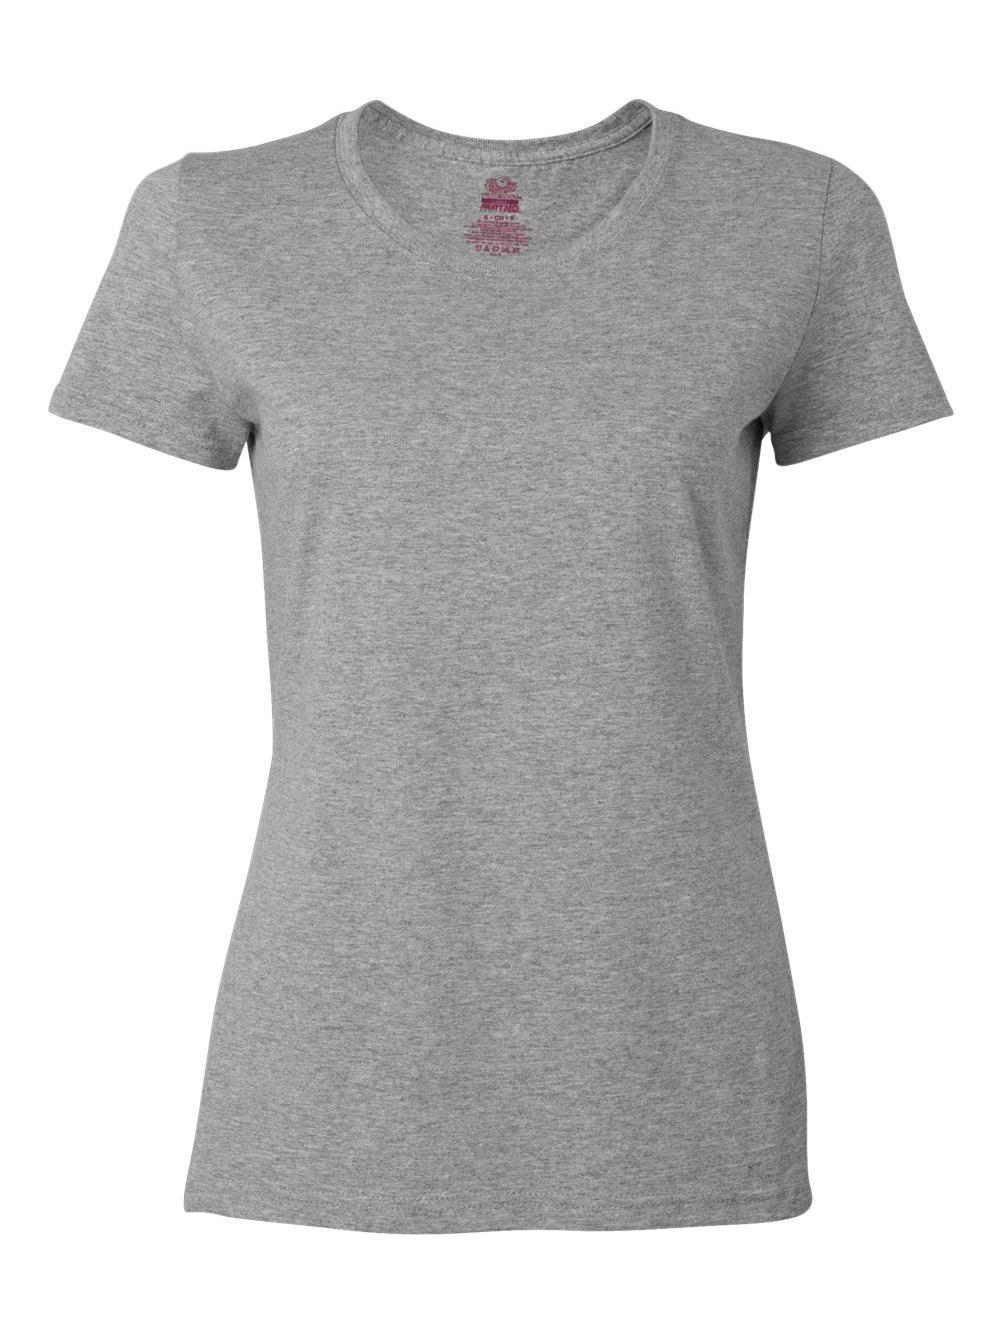 Fruit-of-the-Loom-HD-Cotton-Women-039-s-Short-Sleeve-T-Shirt-L3930R thumbnail 3